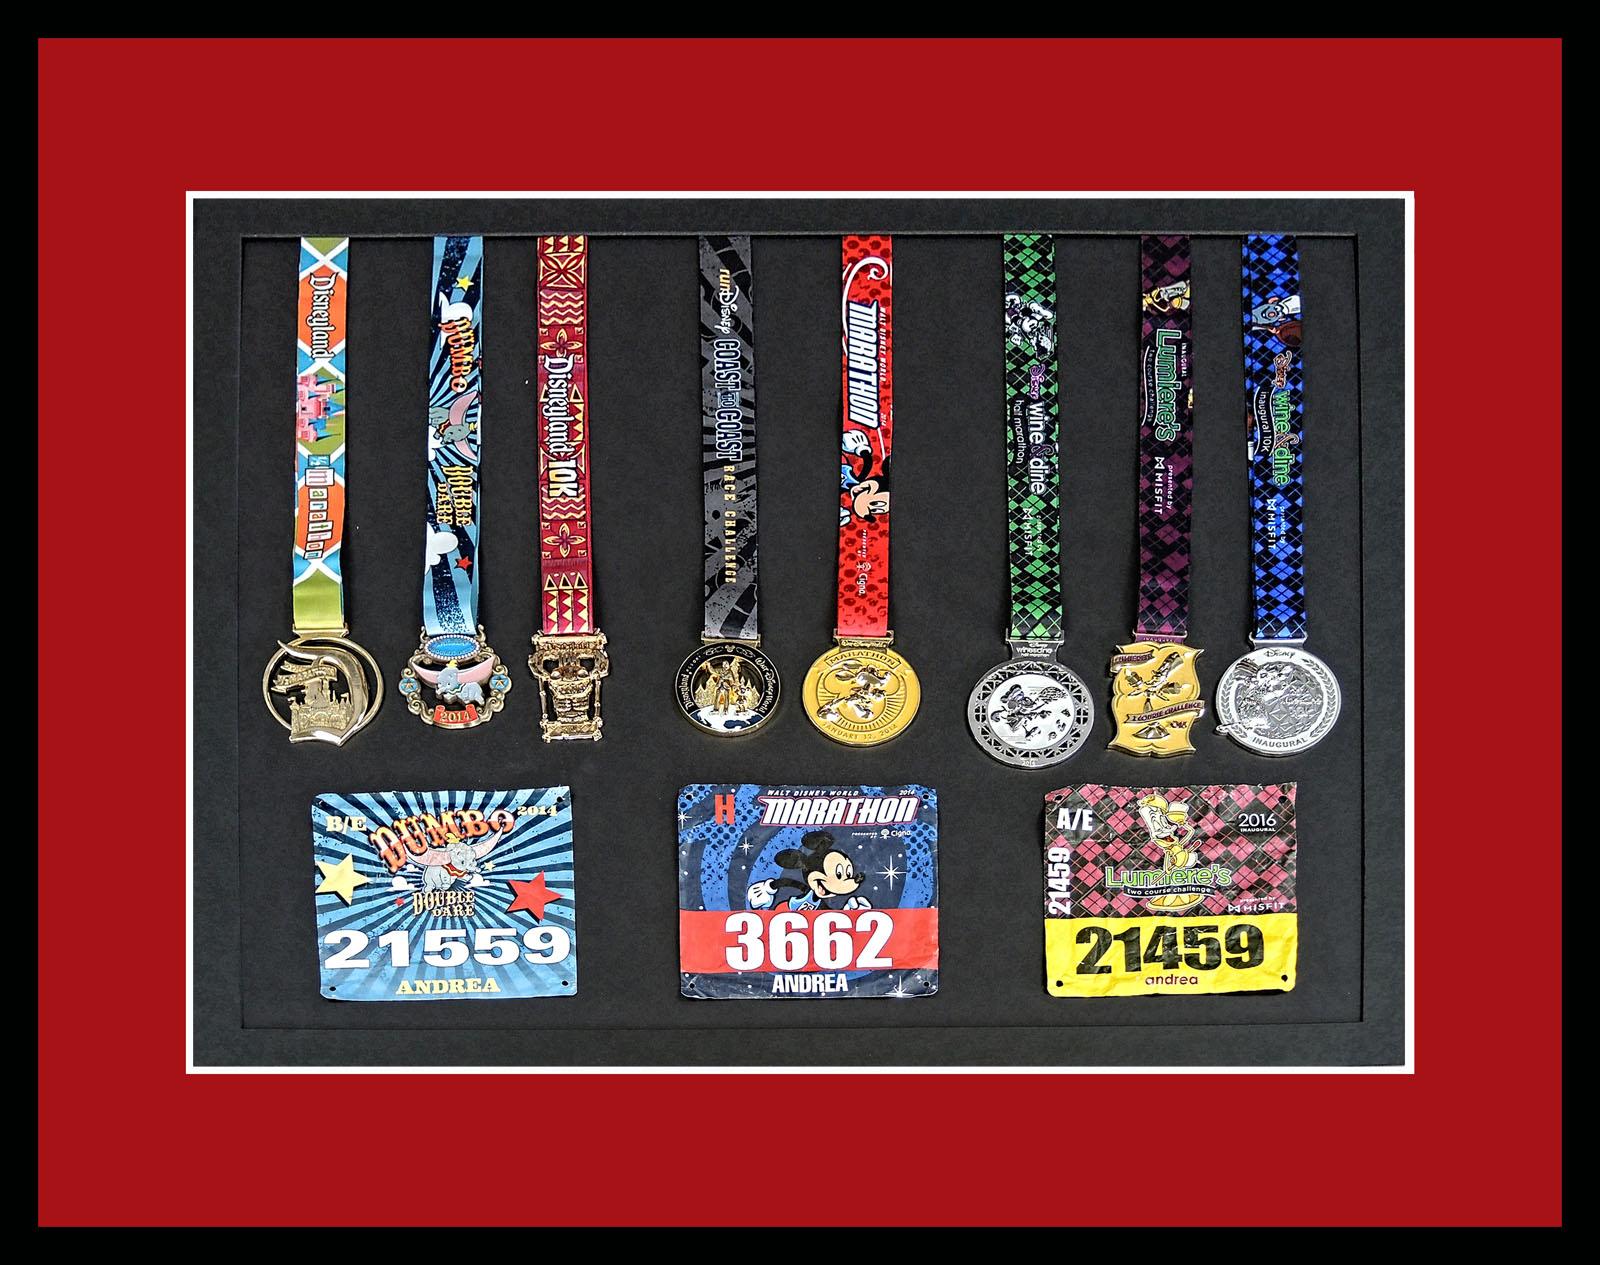 SM Marathon Medals Framed